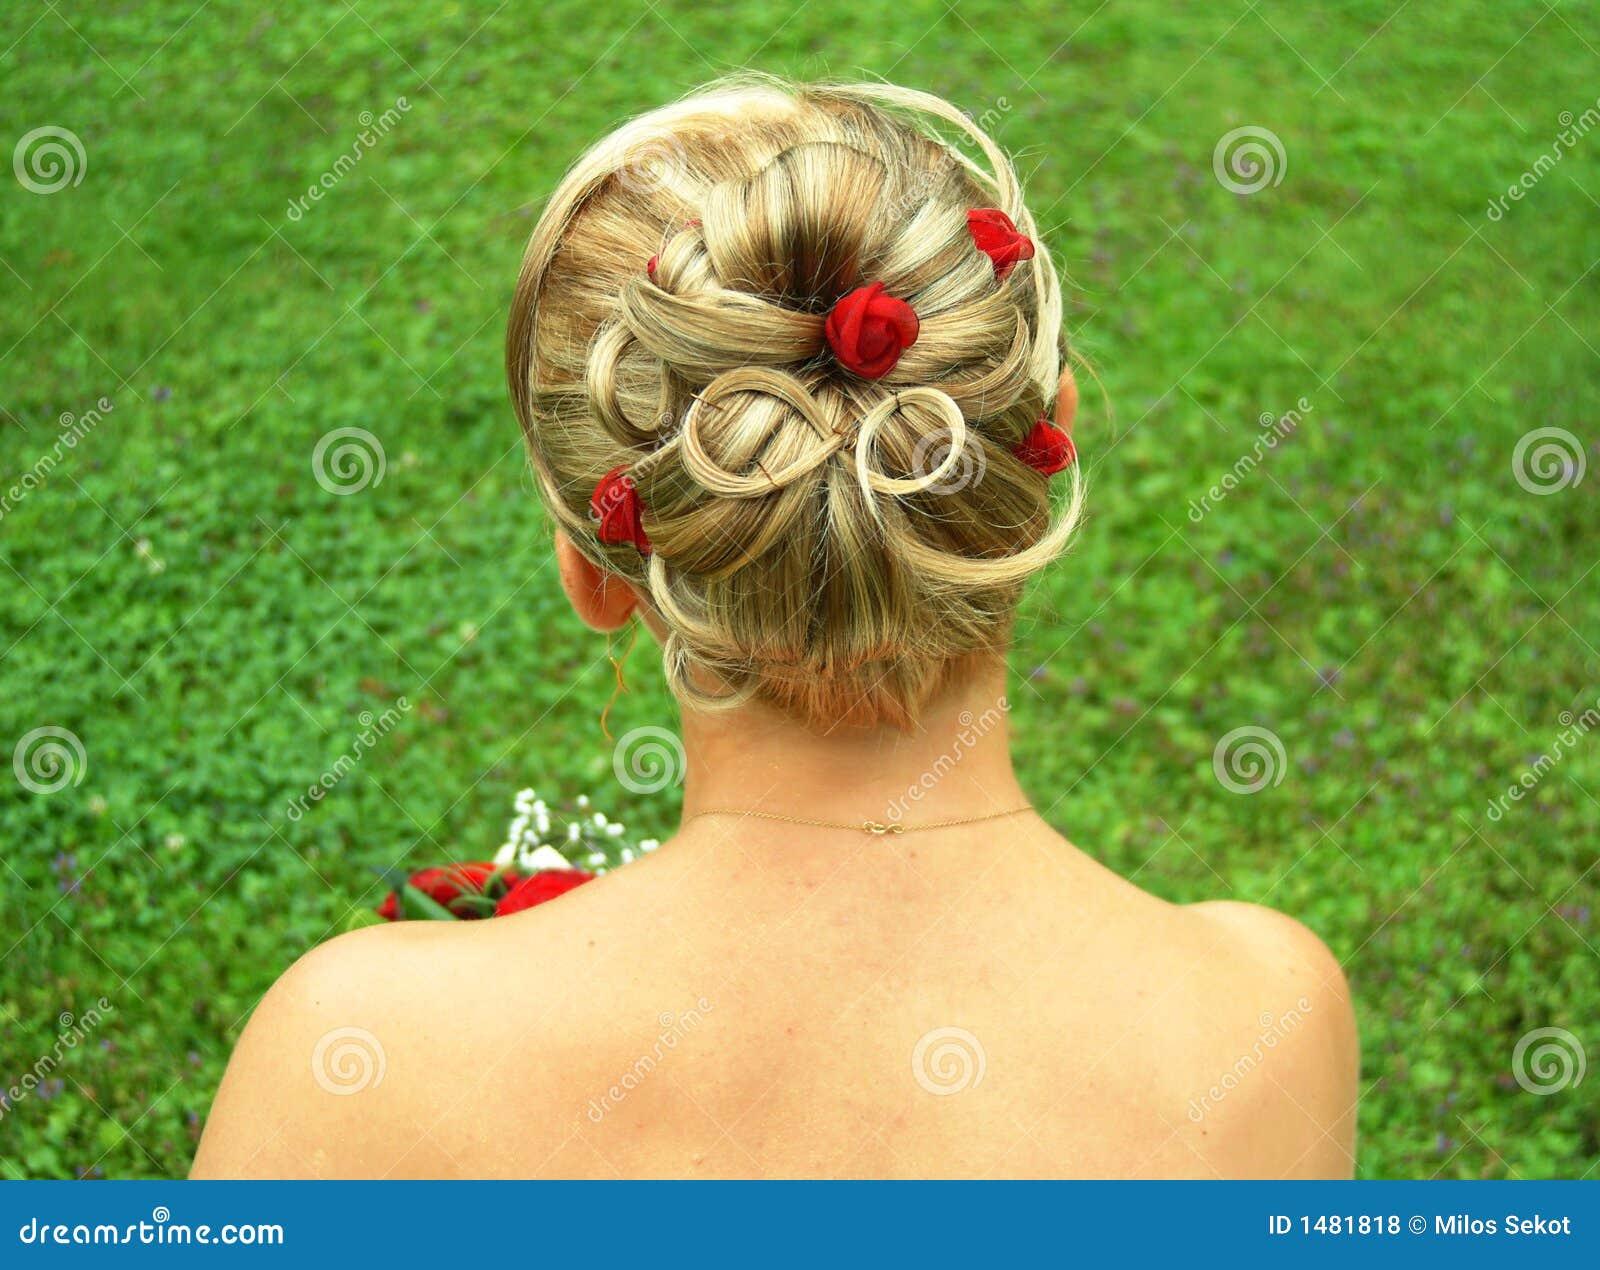 bridal hair style stock photo. image of female, flower - 1481818